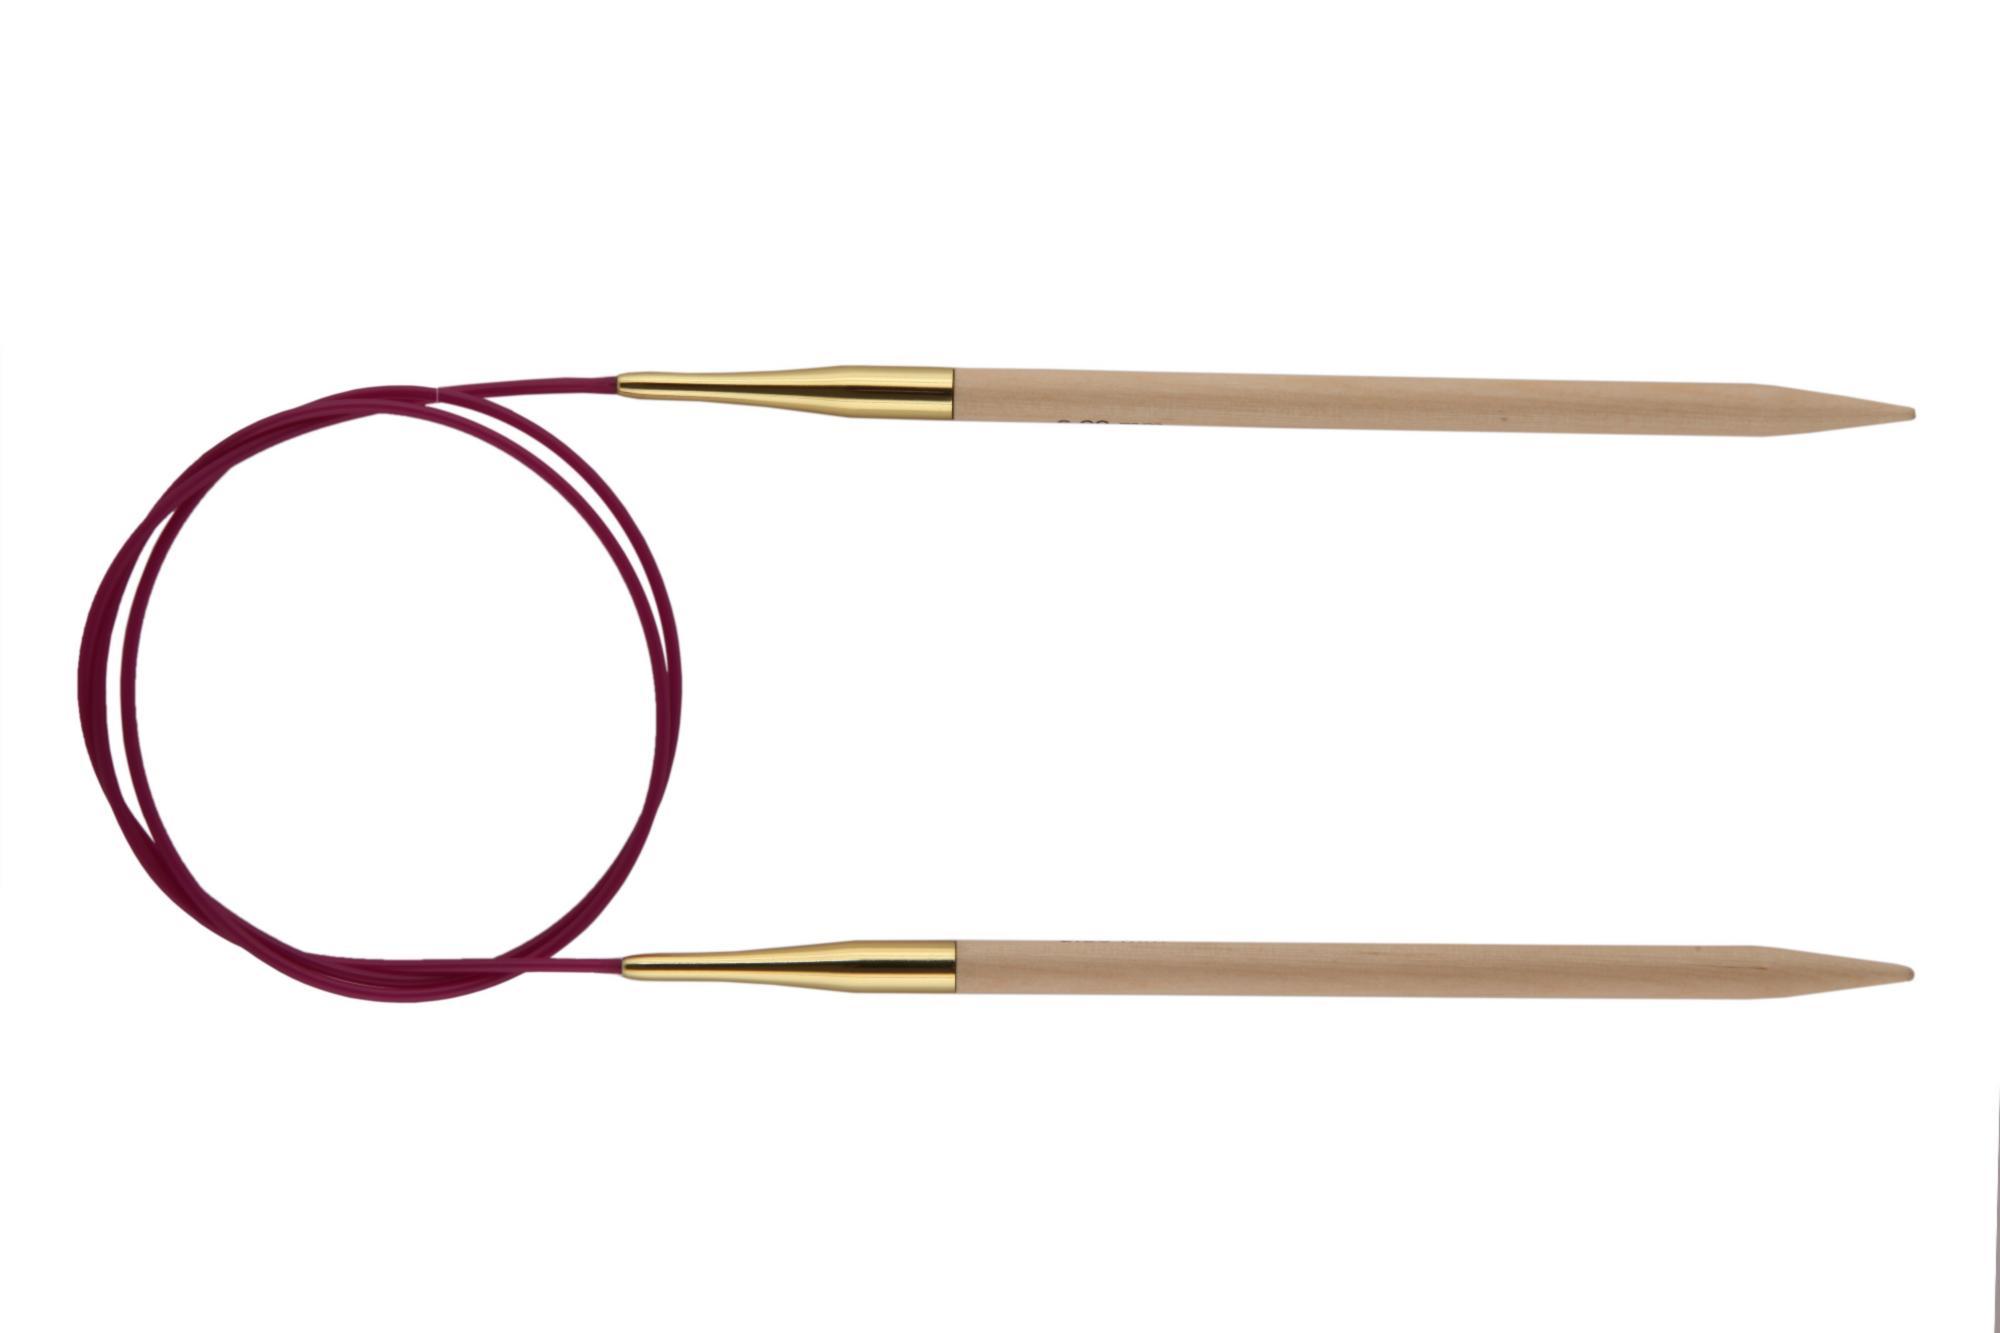 Спицы круговые 120 см Basix Birch Wood KnitPro, 35402, 3.50 мм